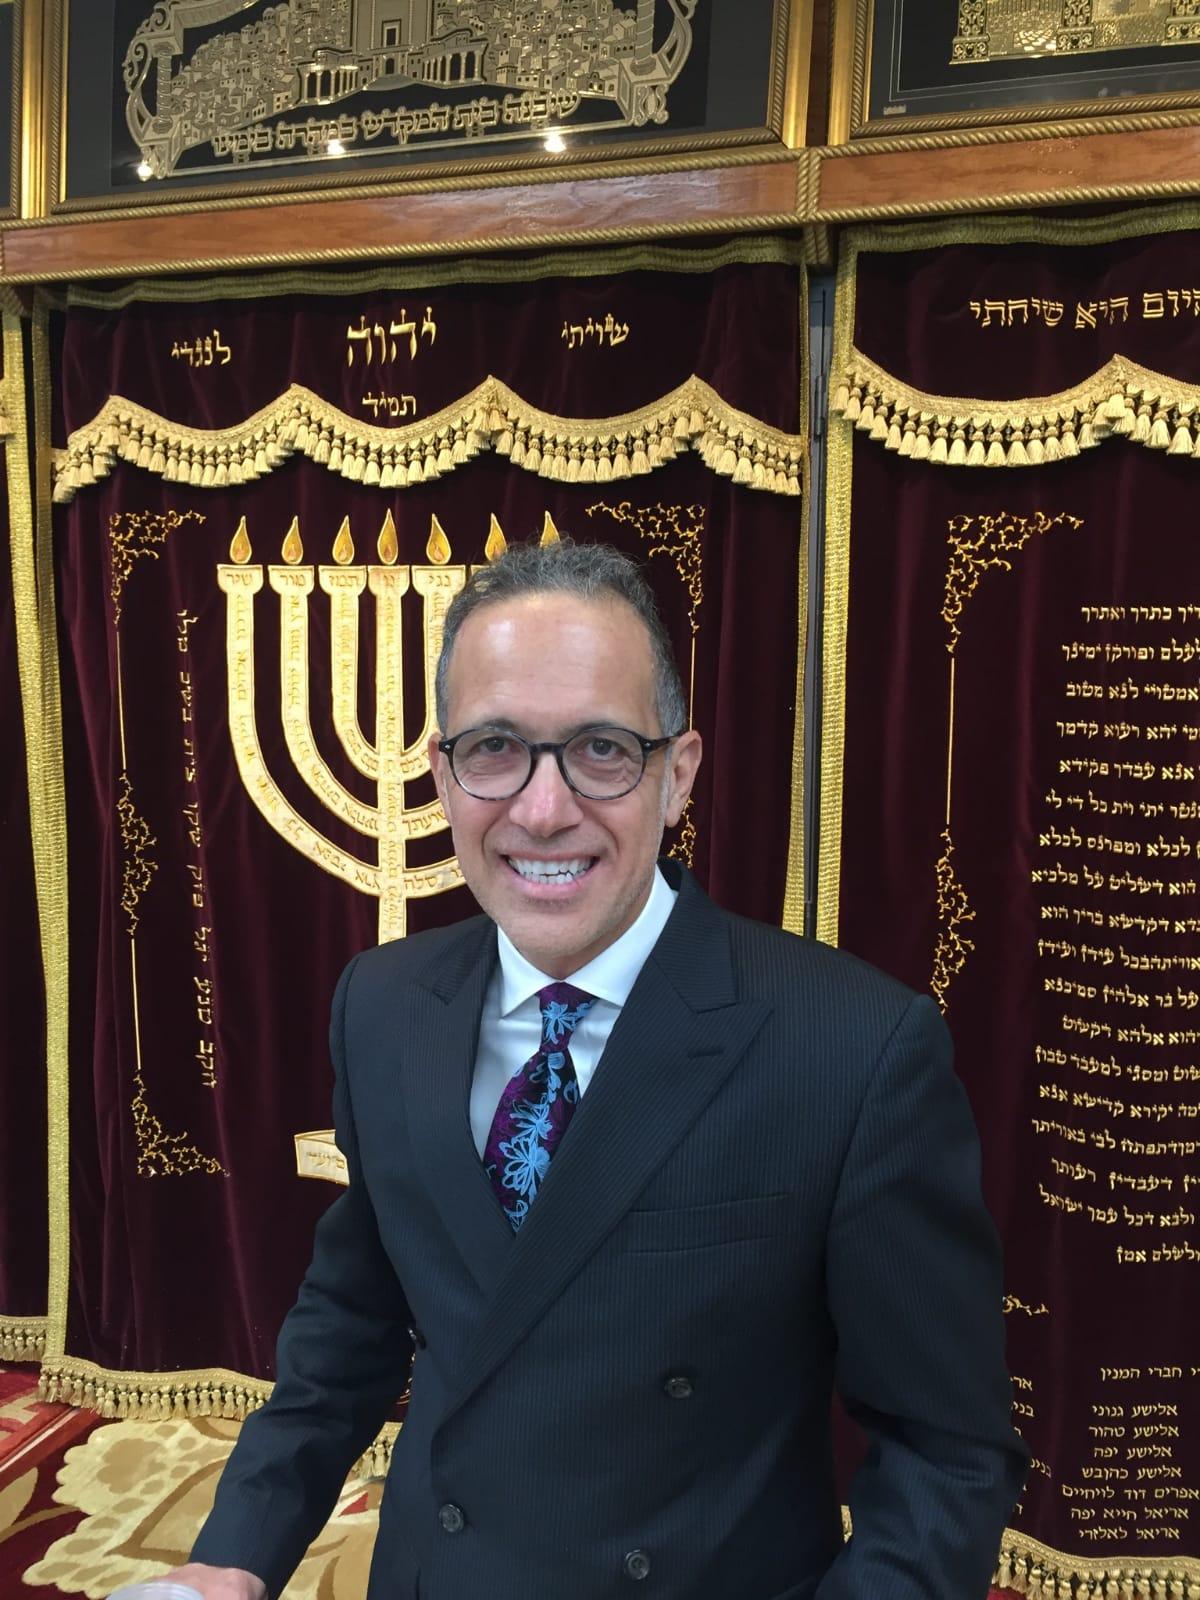 Rabbi Dr. Jack Cohen